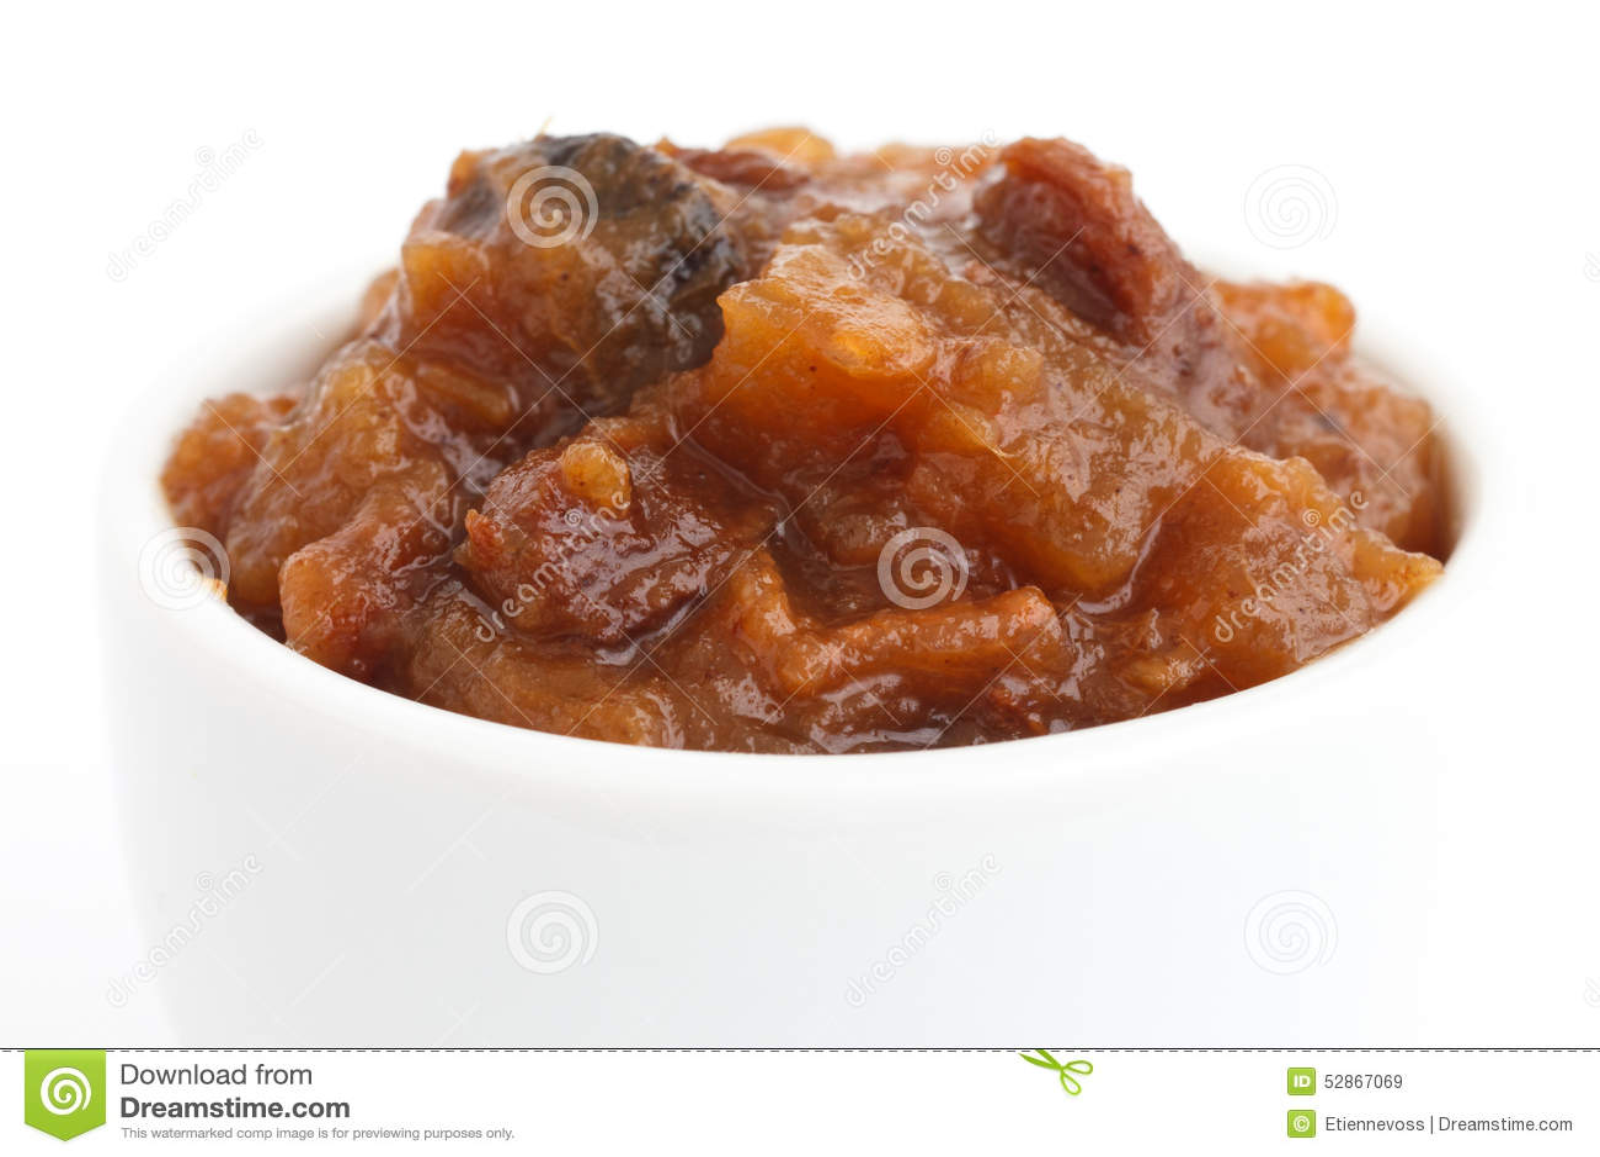 Detalhe de chutney áspero do fruto no prato branco